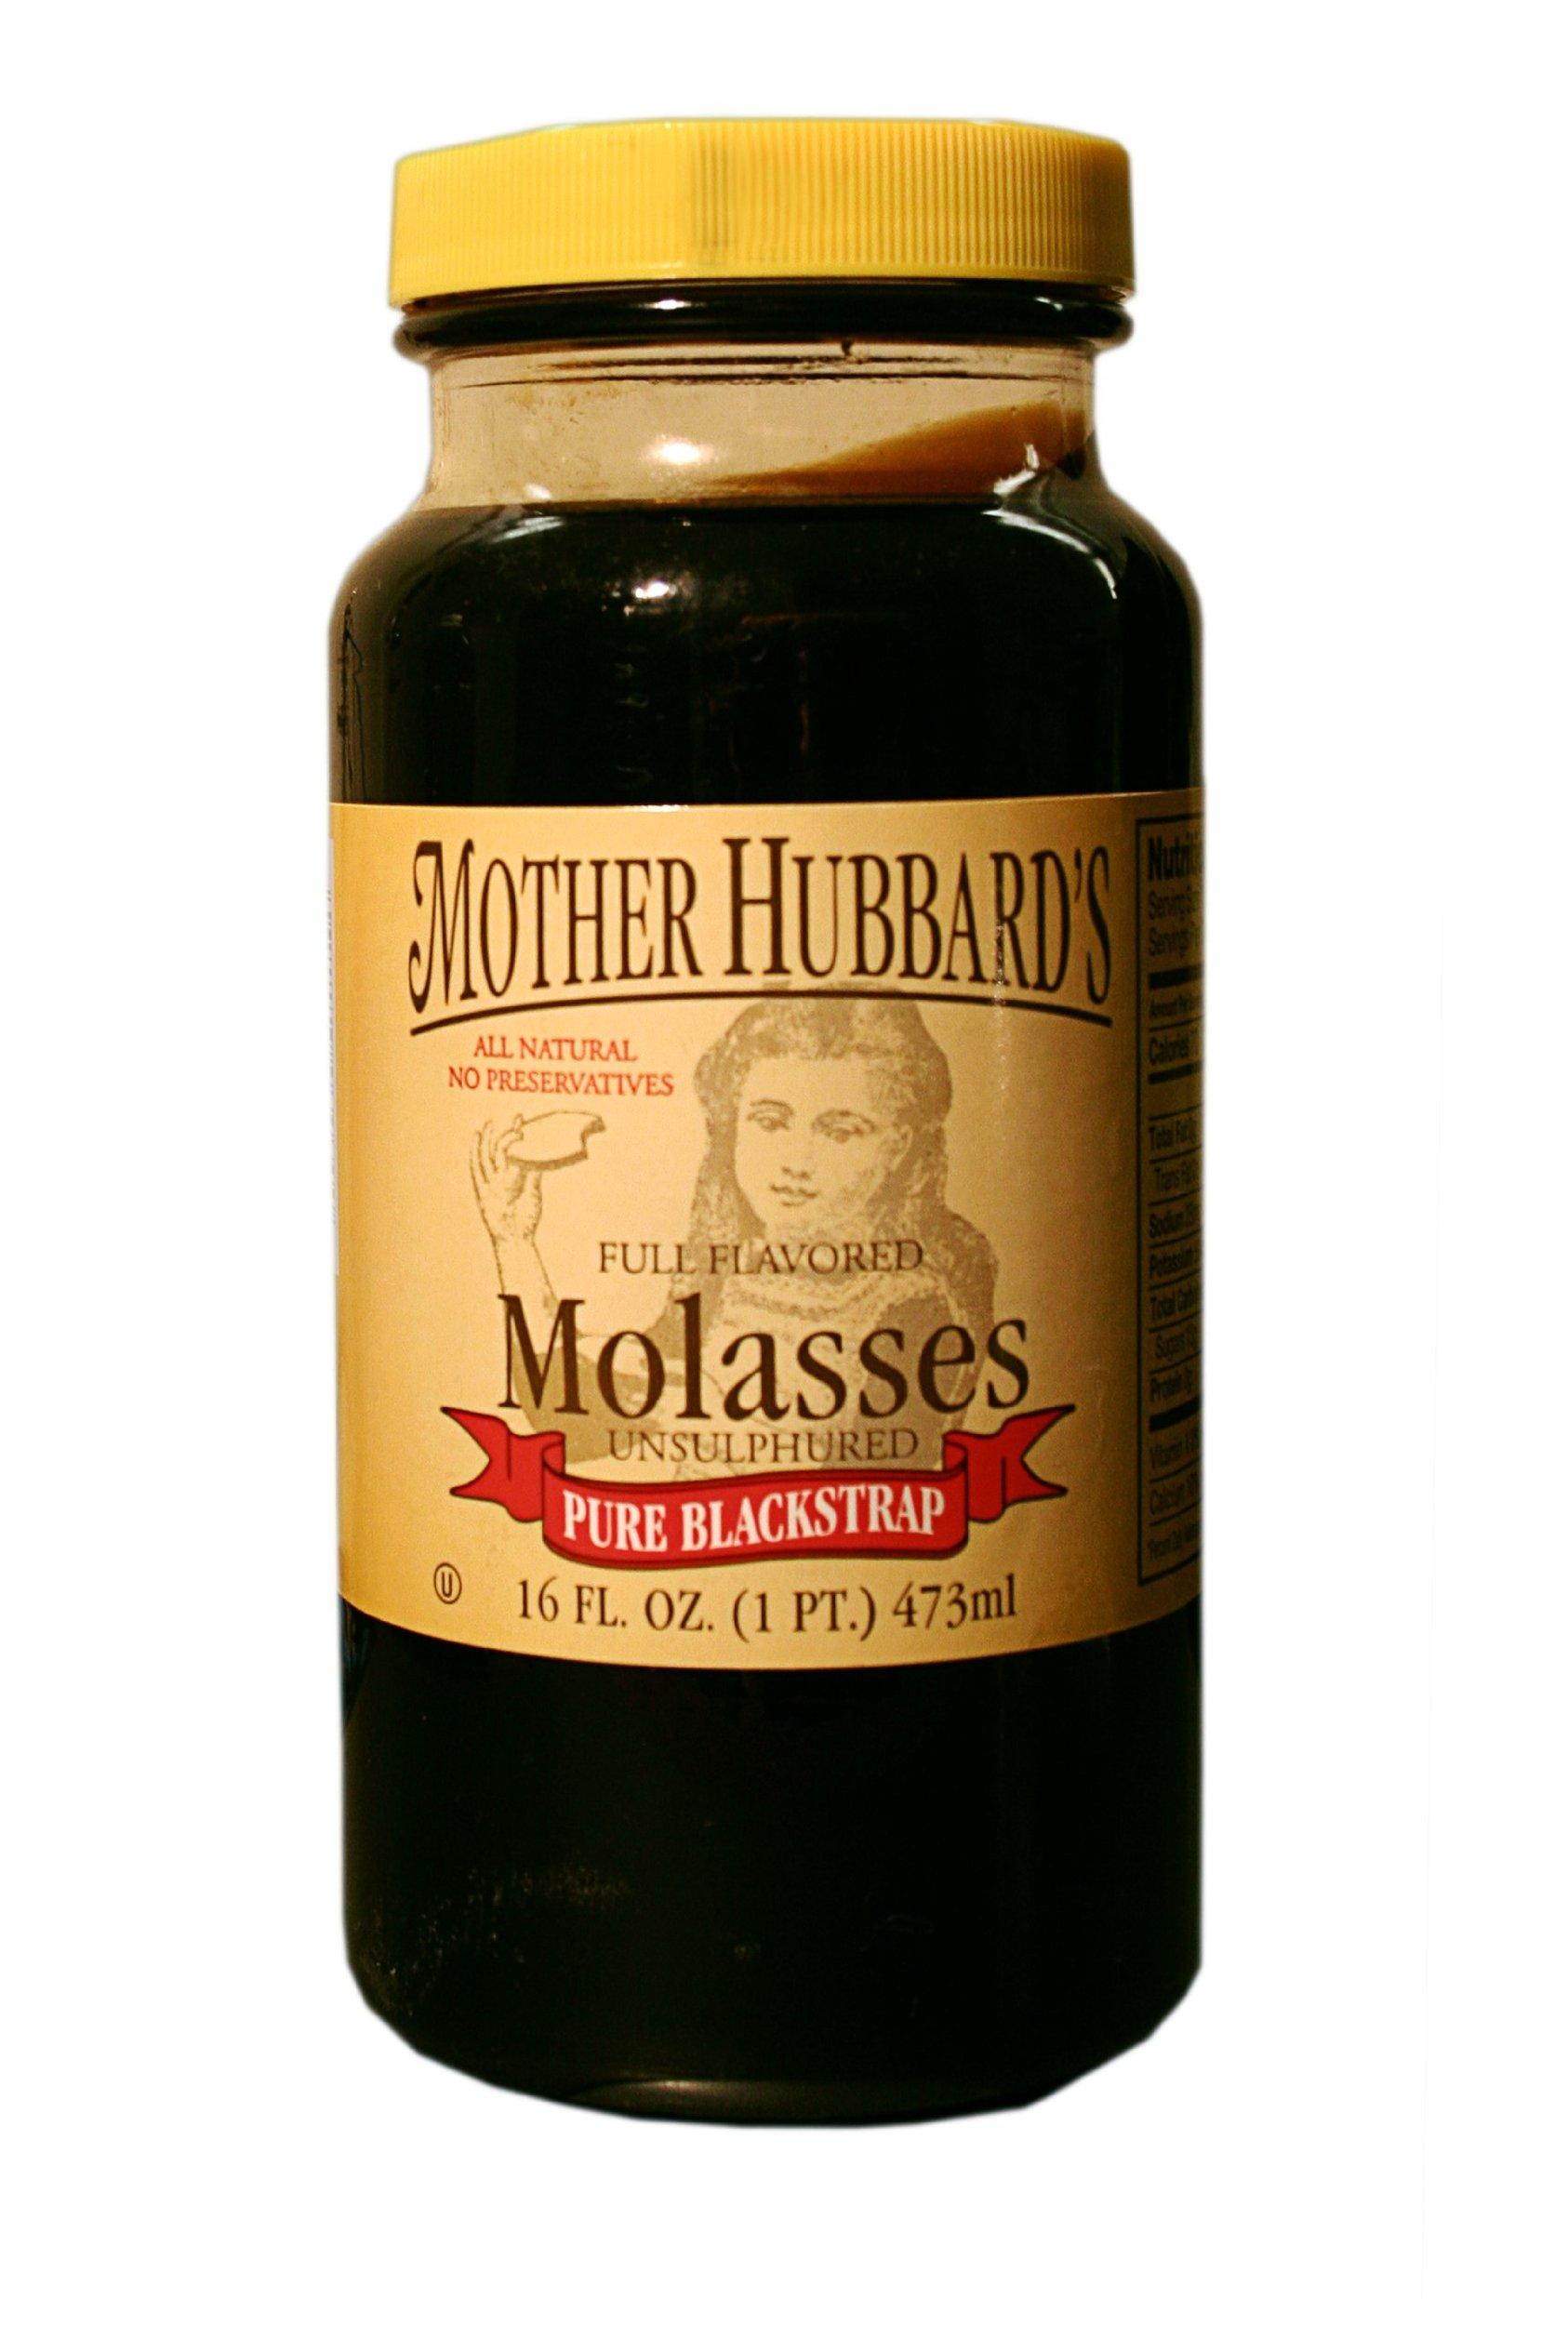 Mother Hubbard Molasses, Blackstrap, 16-Ounce Bottles (Pack of 6)